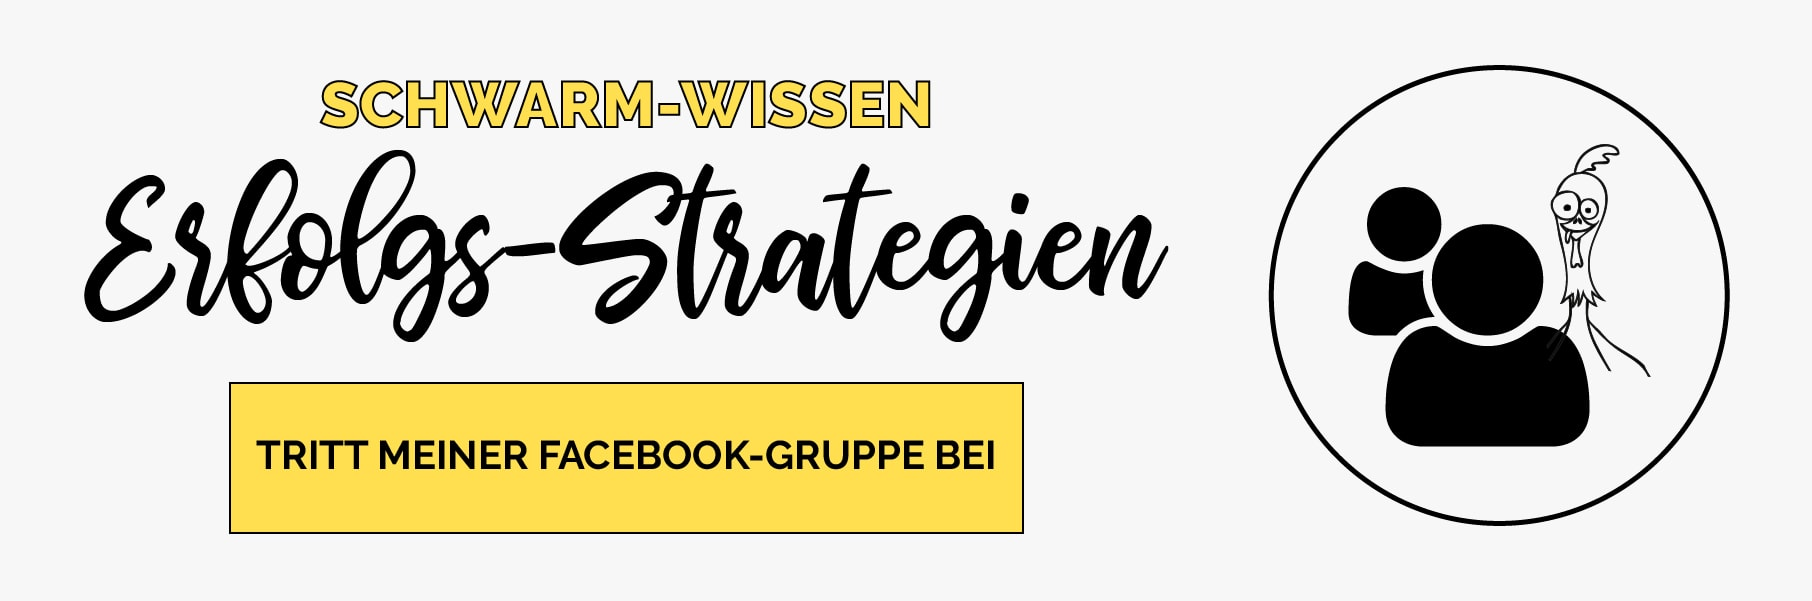 Blogger-Coaching.de - Erfolgsstrategien für deinen Blog - Tritt meiner Facebook-Gruppe bei